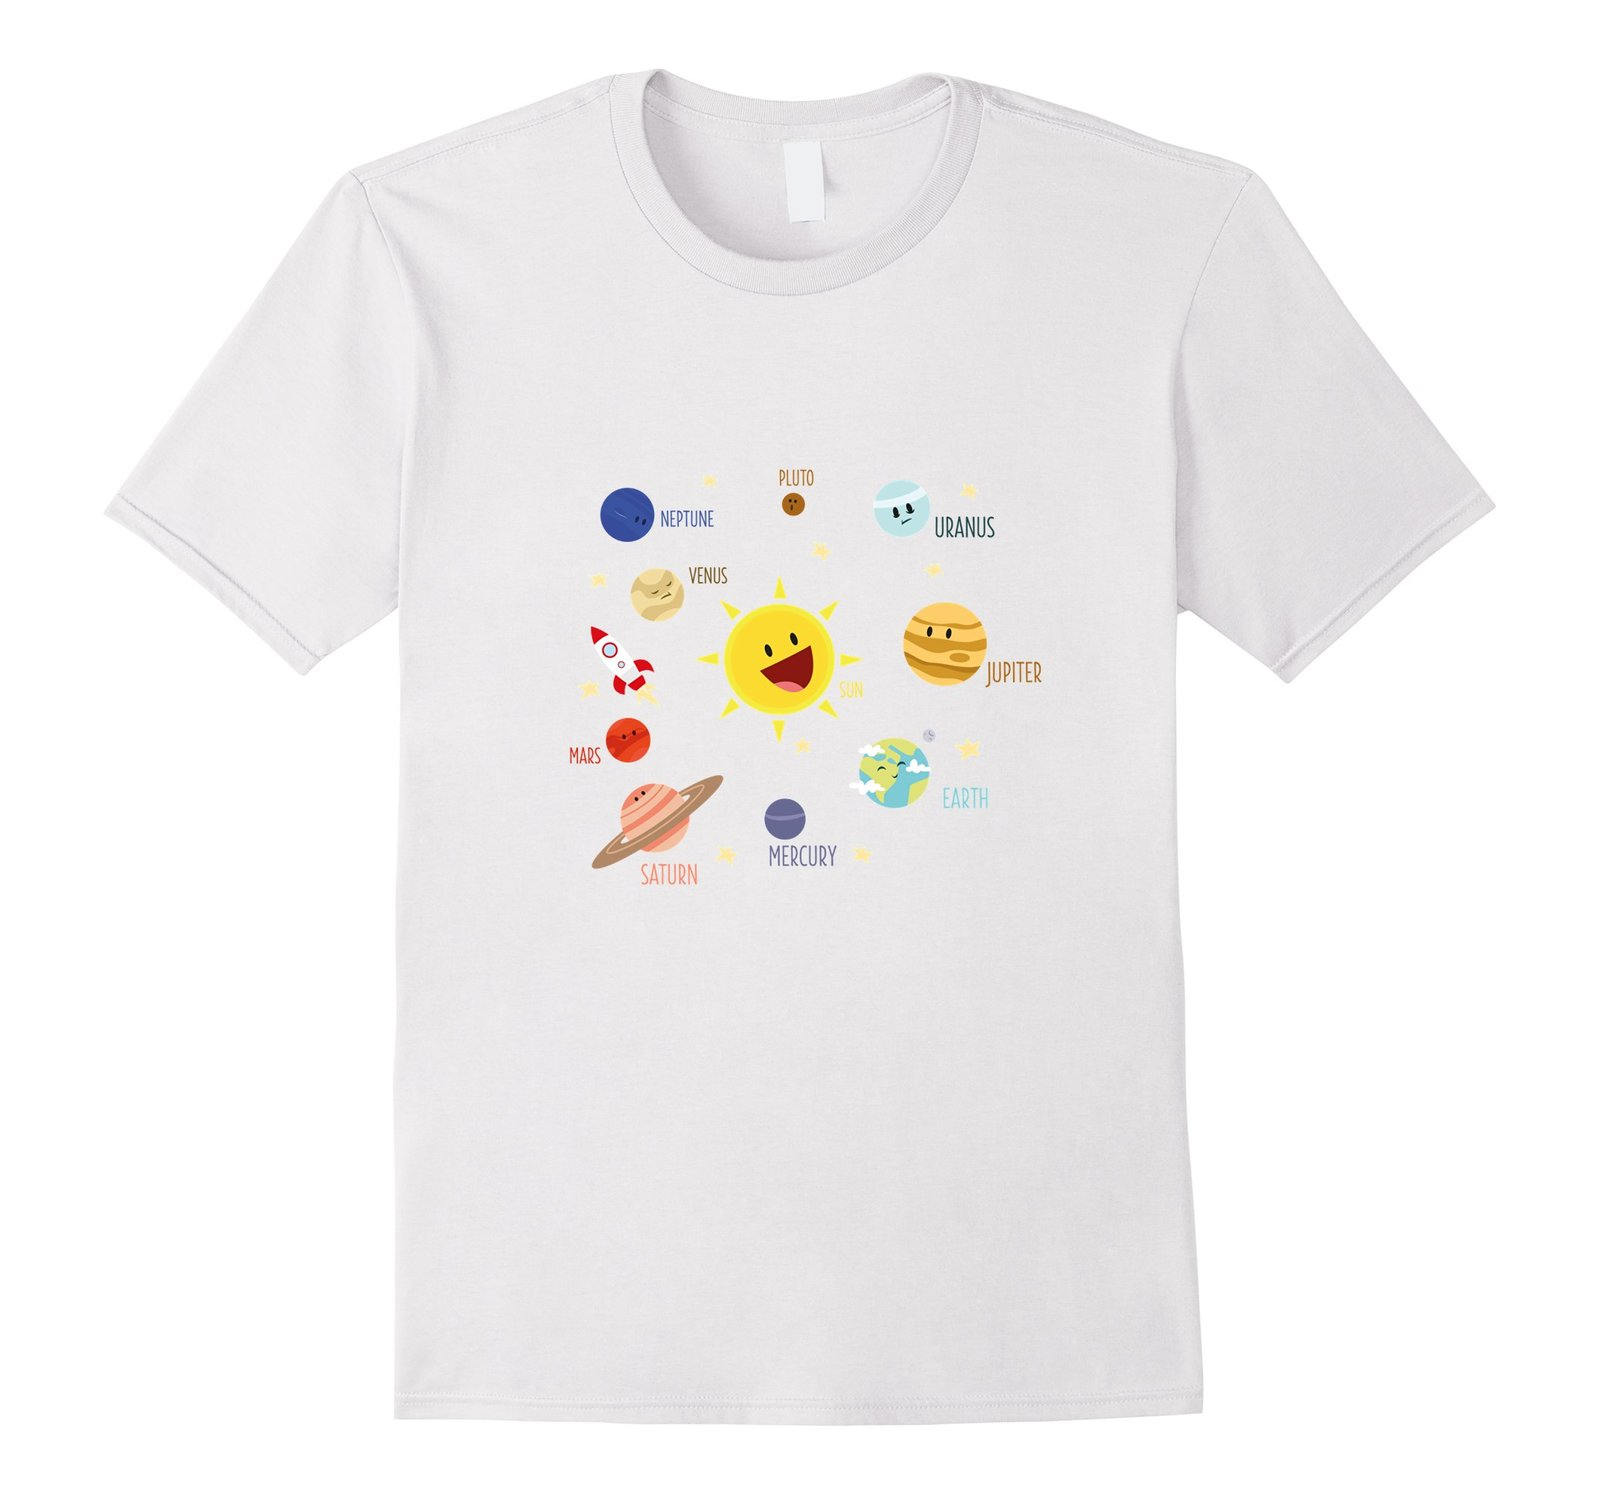 family t shirt solar system - photo #30